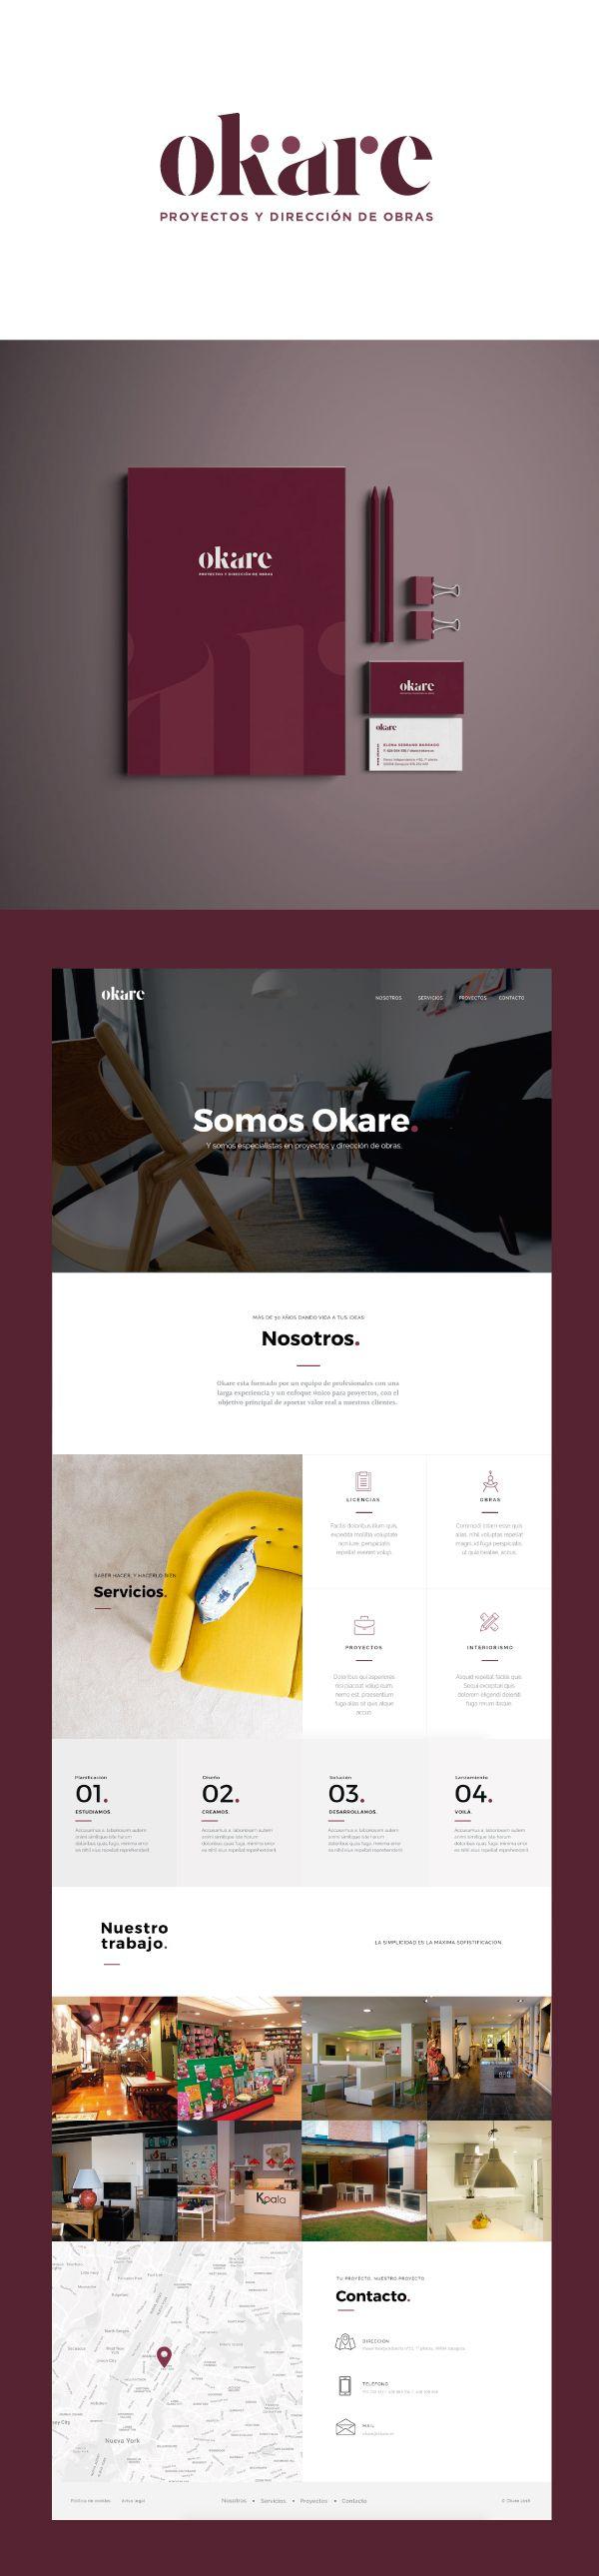 Branding and web design